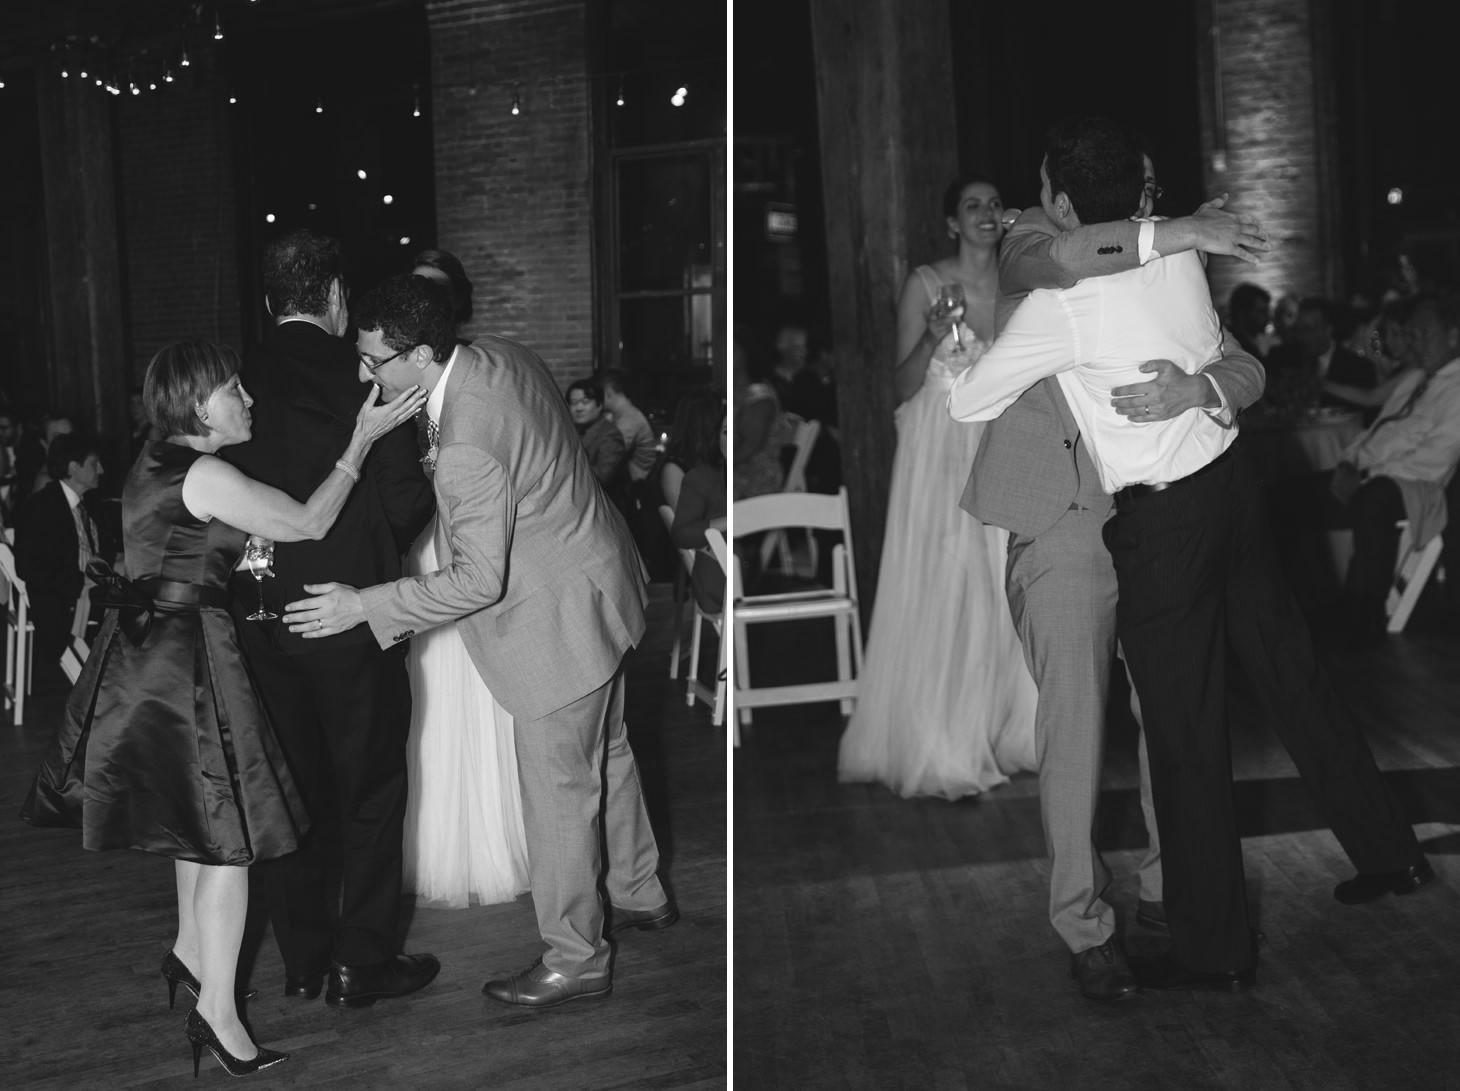 037-nyc-dumbo-loft-brooklyn-wedding-photographer-smitten-chickens-photo-.jpg